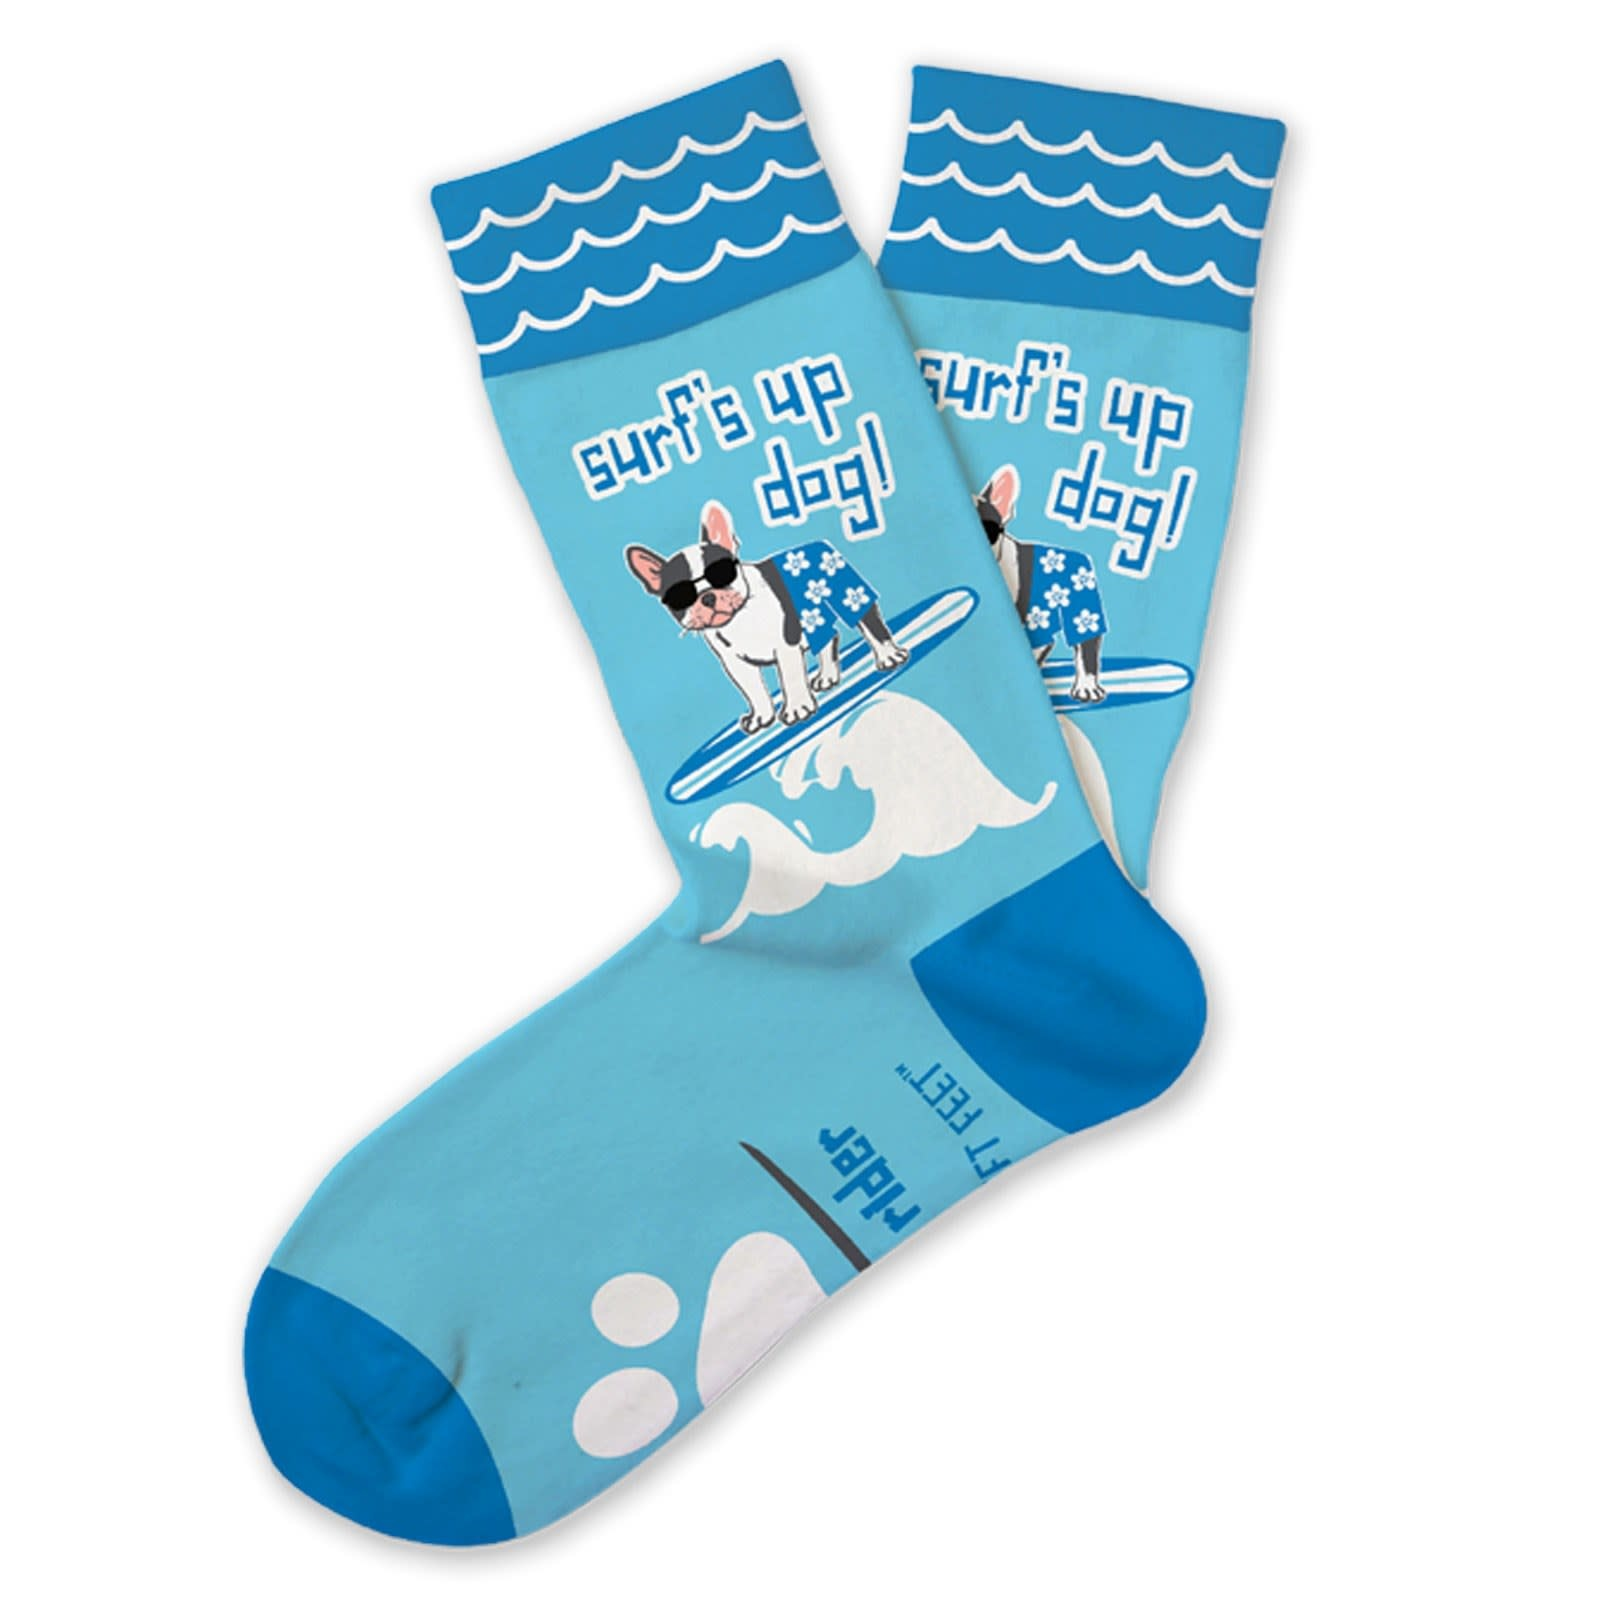 DM MERCHANDISING Surf's Up Dog Socks - Ages 7-10